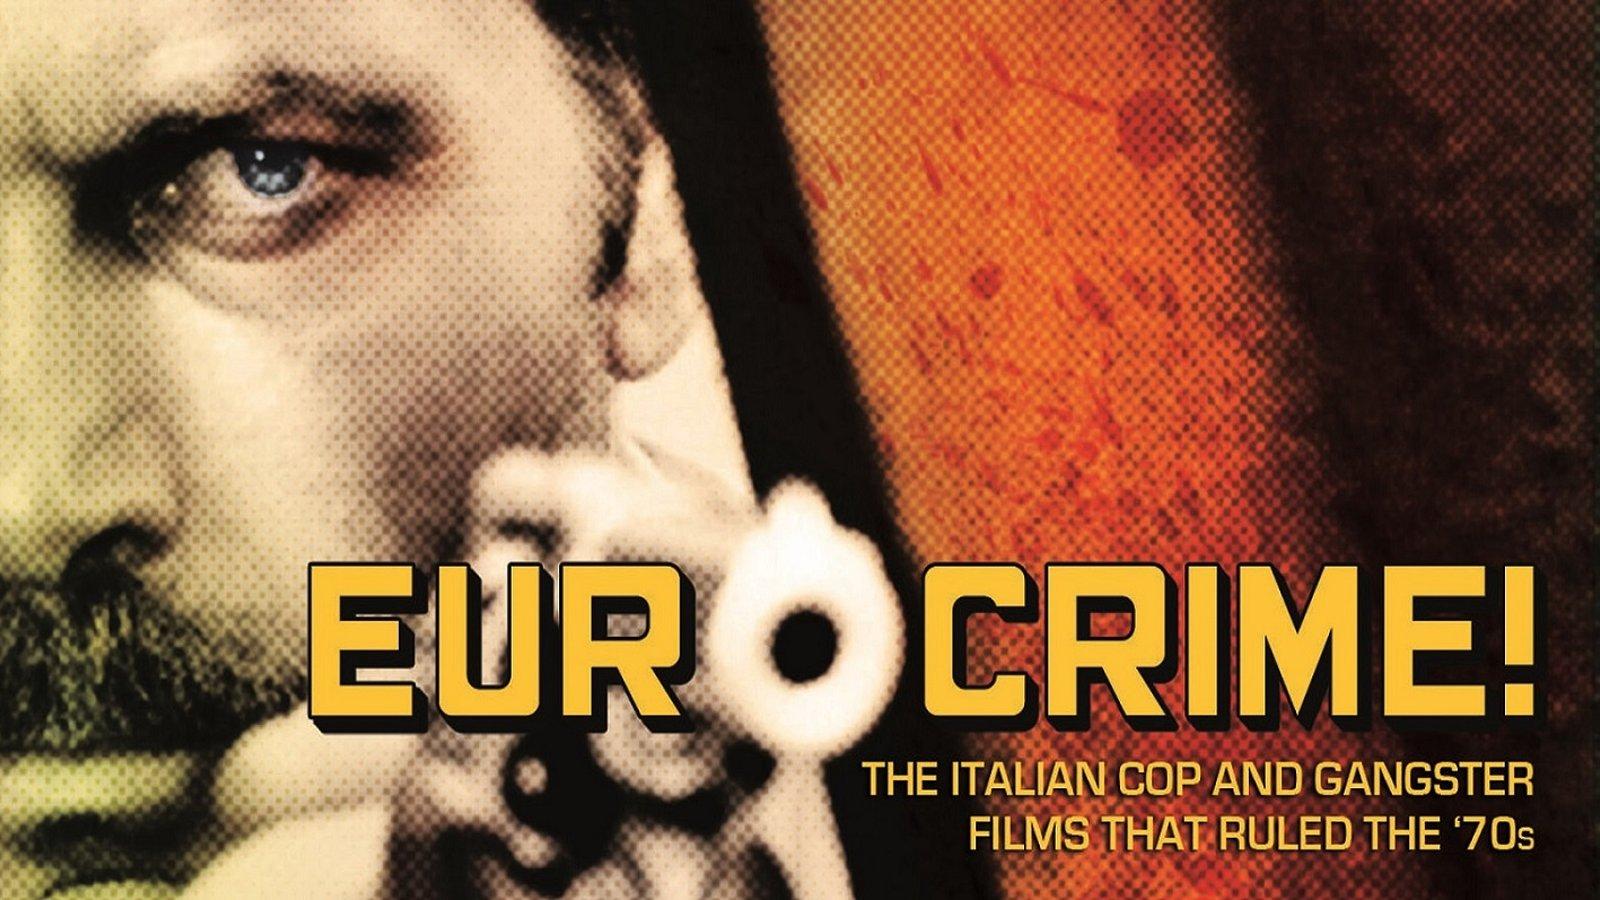 Eurocrime! - Italian Crime Cinema of the 1970s